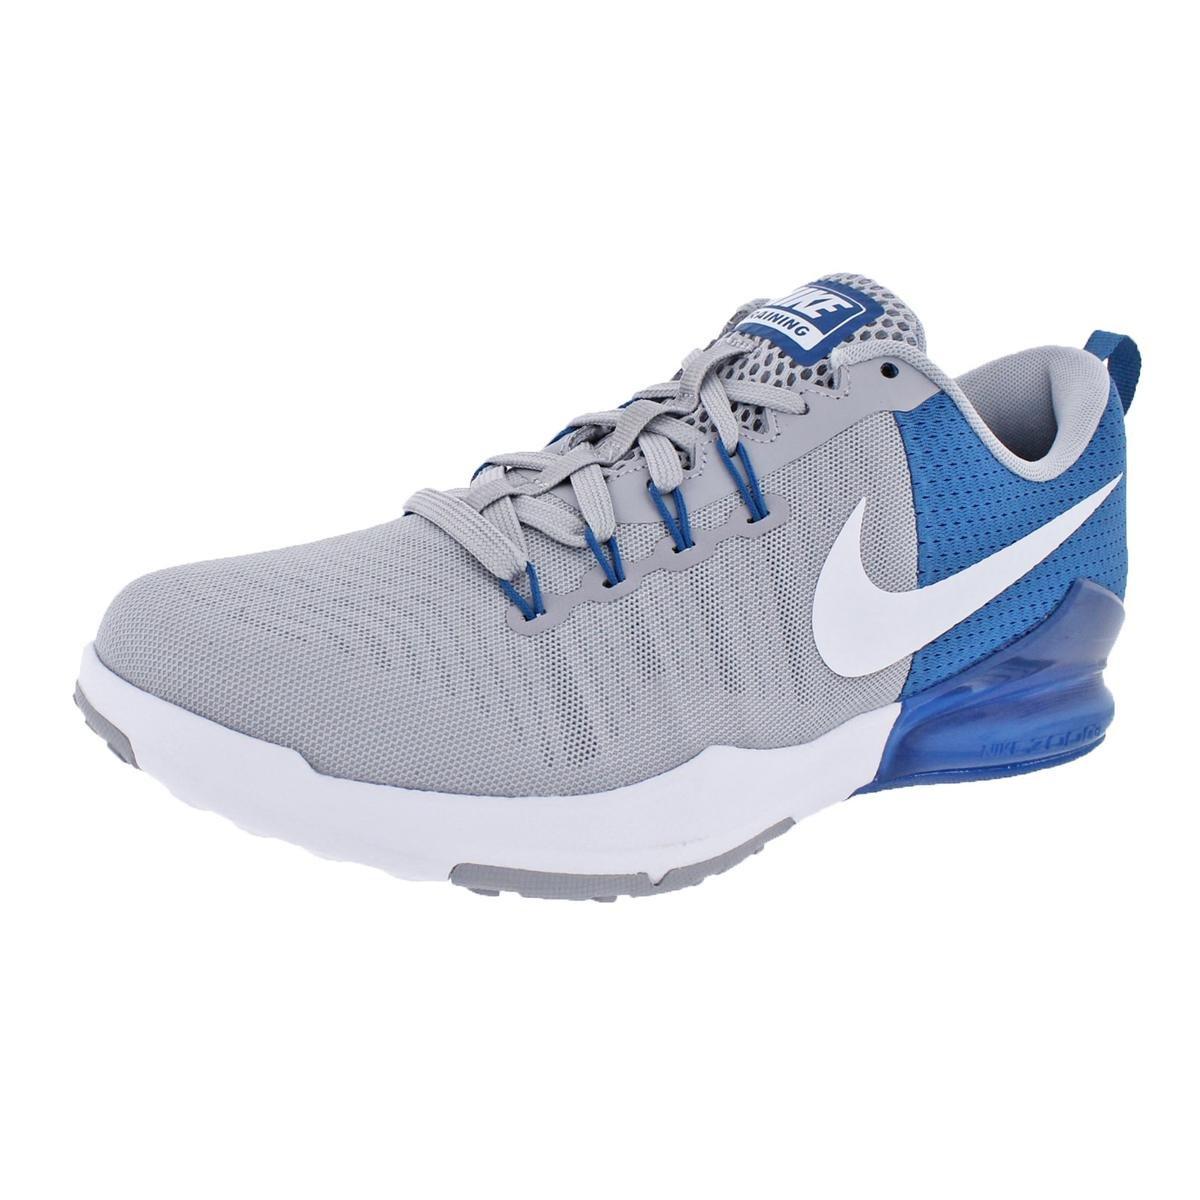 NIKE Mens Zoom Train Action Mesh Running, Cross Training Shoes Gray 6 Medium (D)